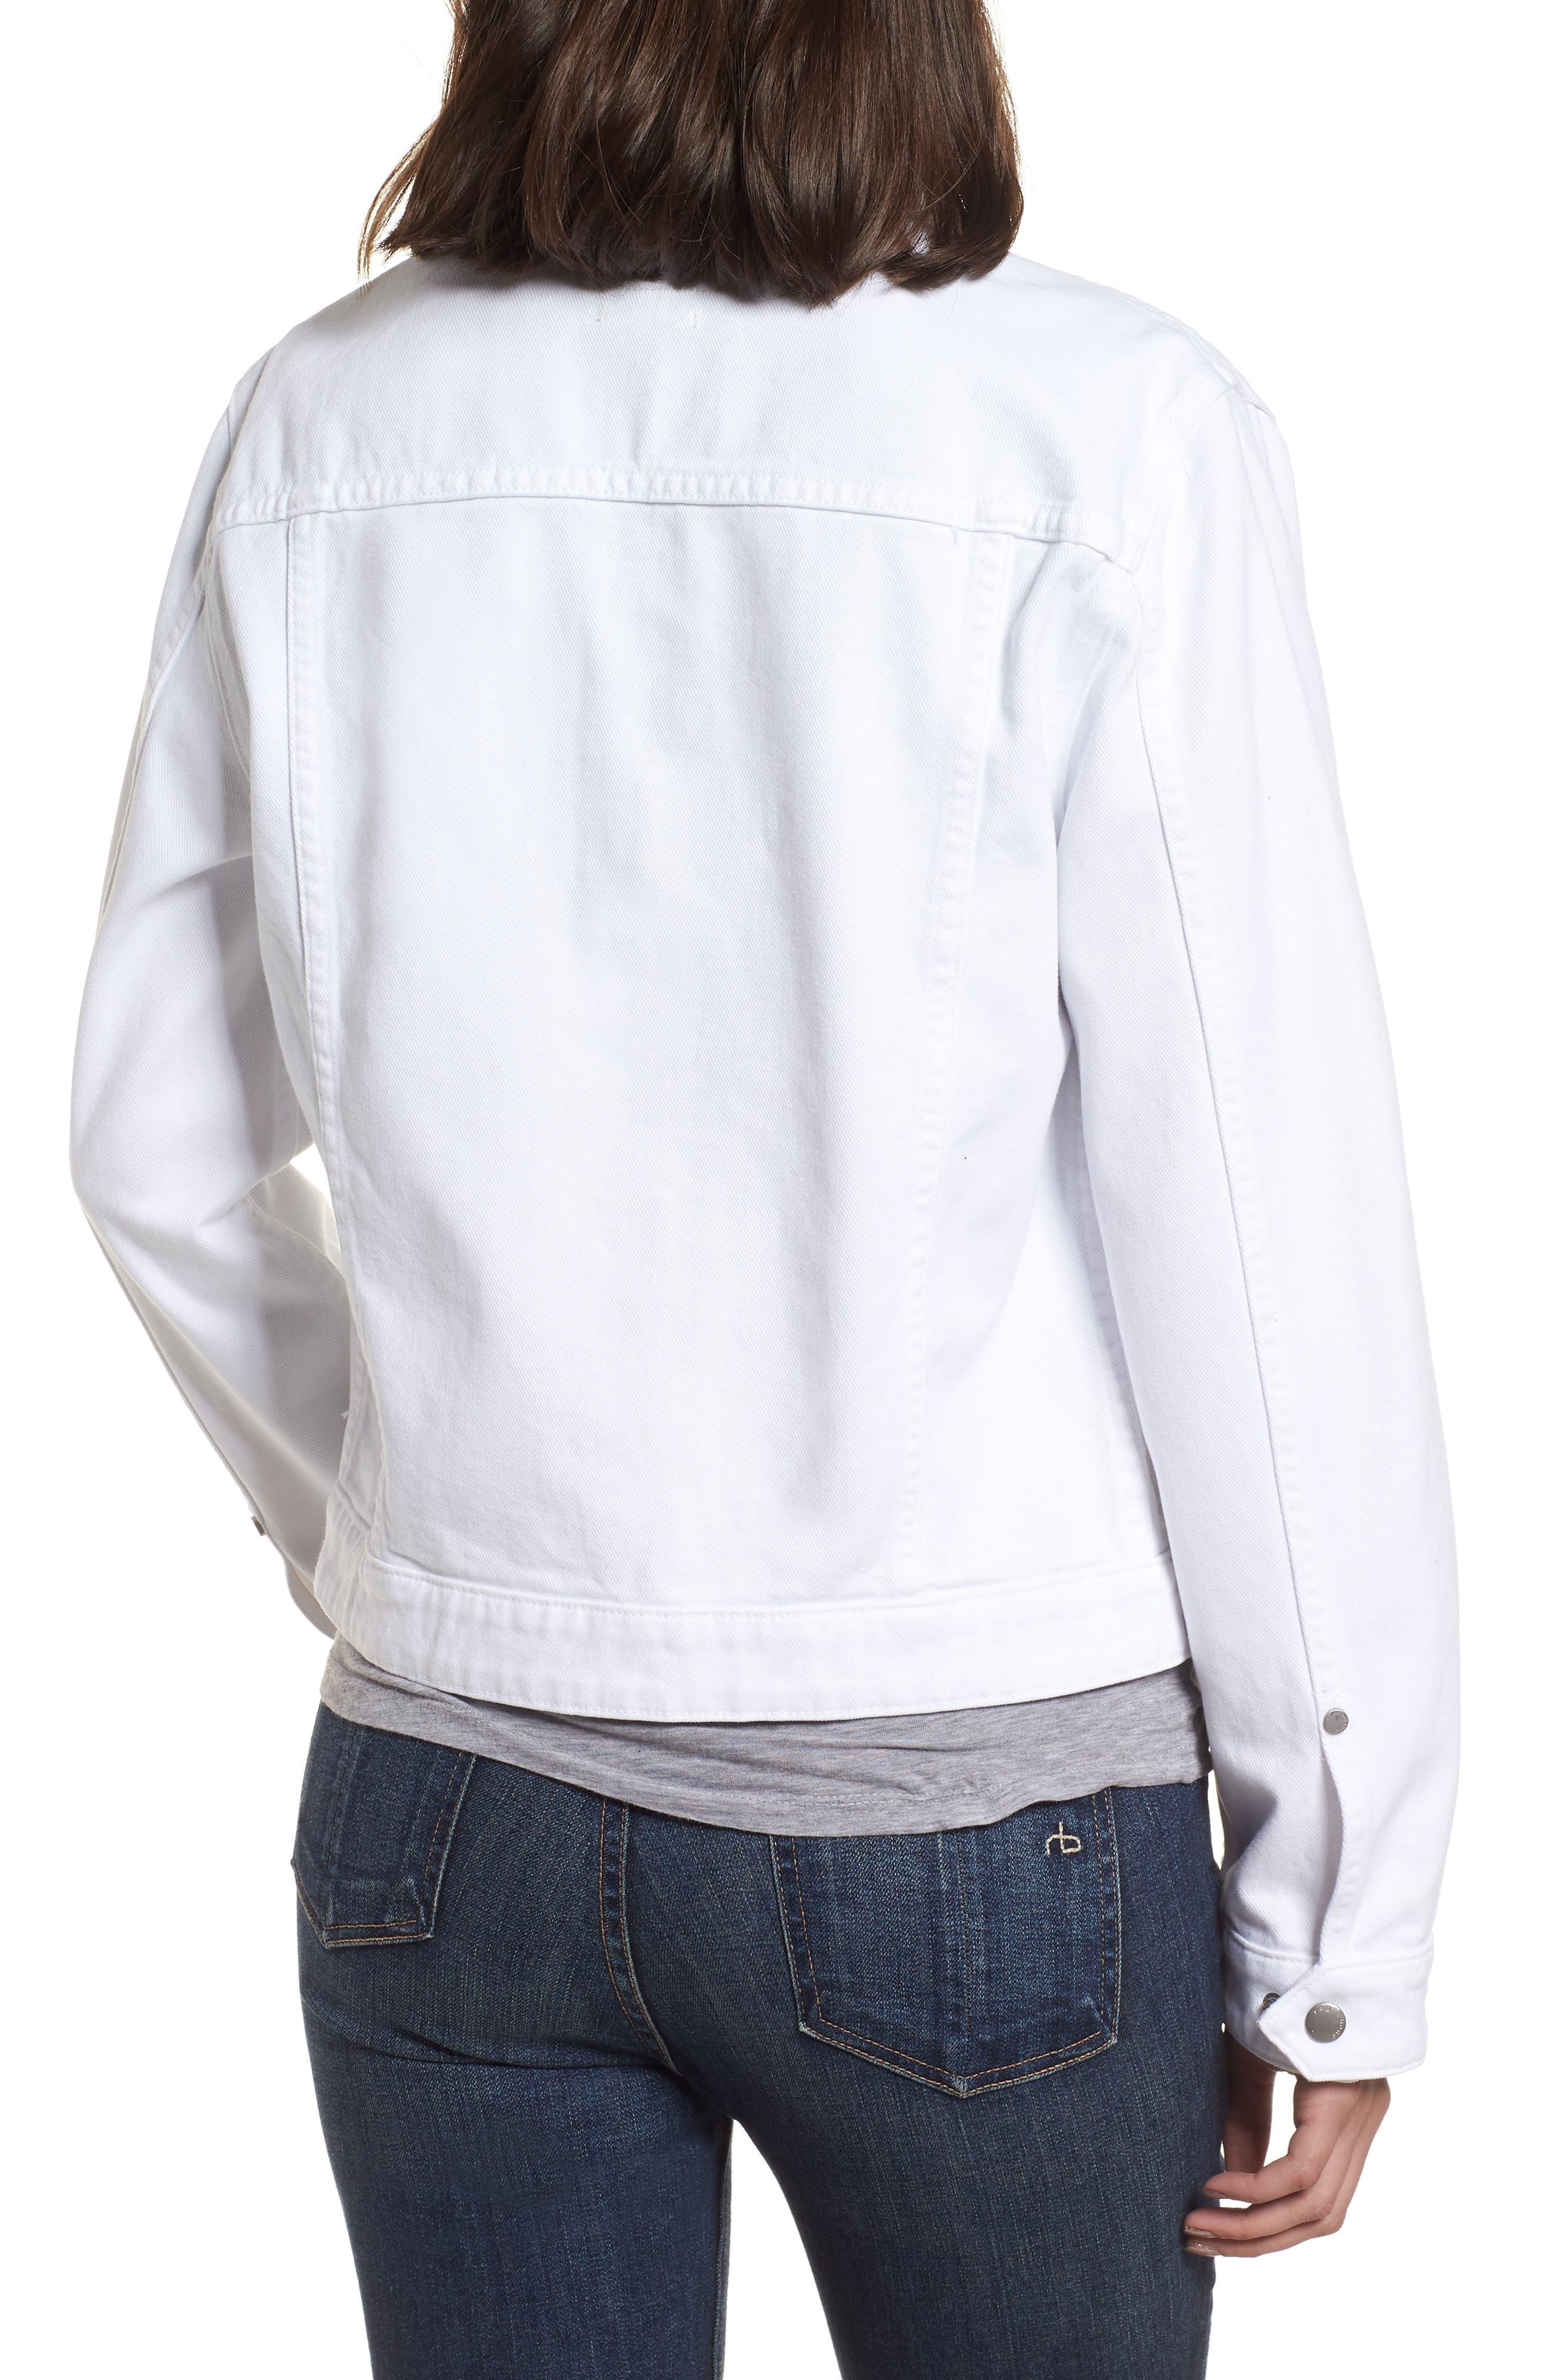 Nico Denim Jacket,                             Alternate thumbnail 2, color,                             100